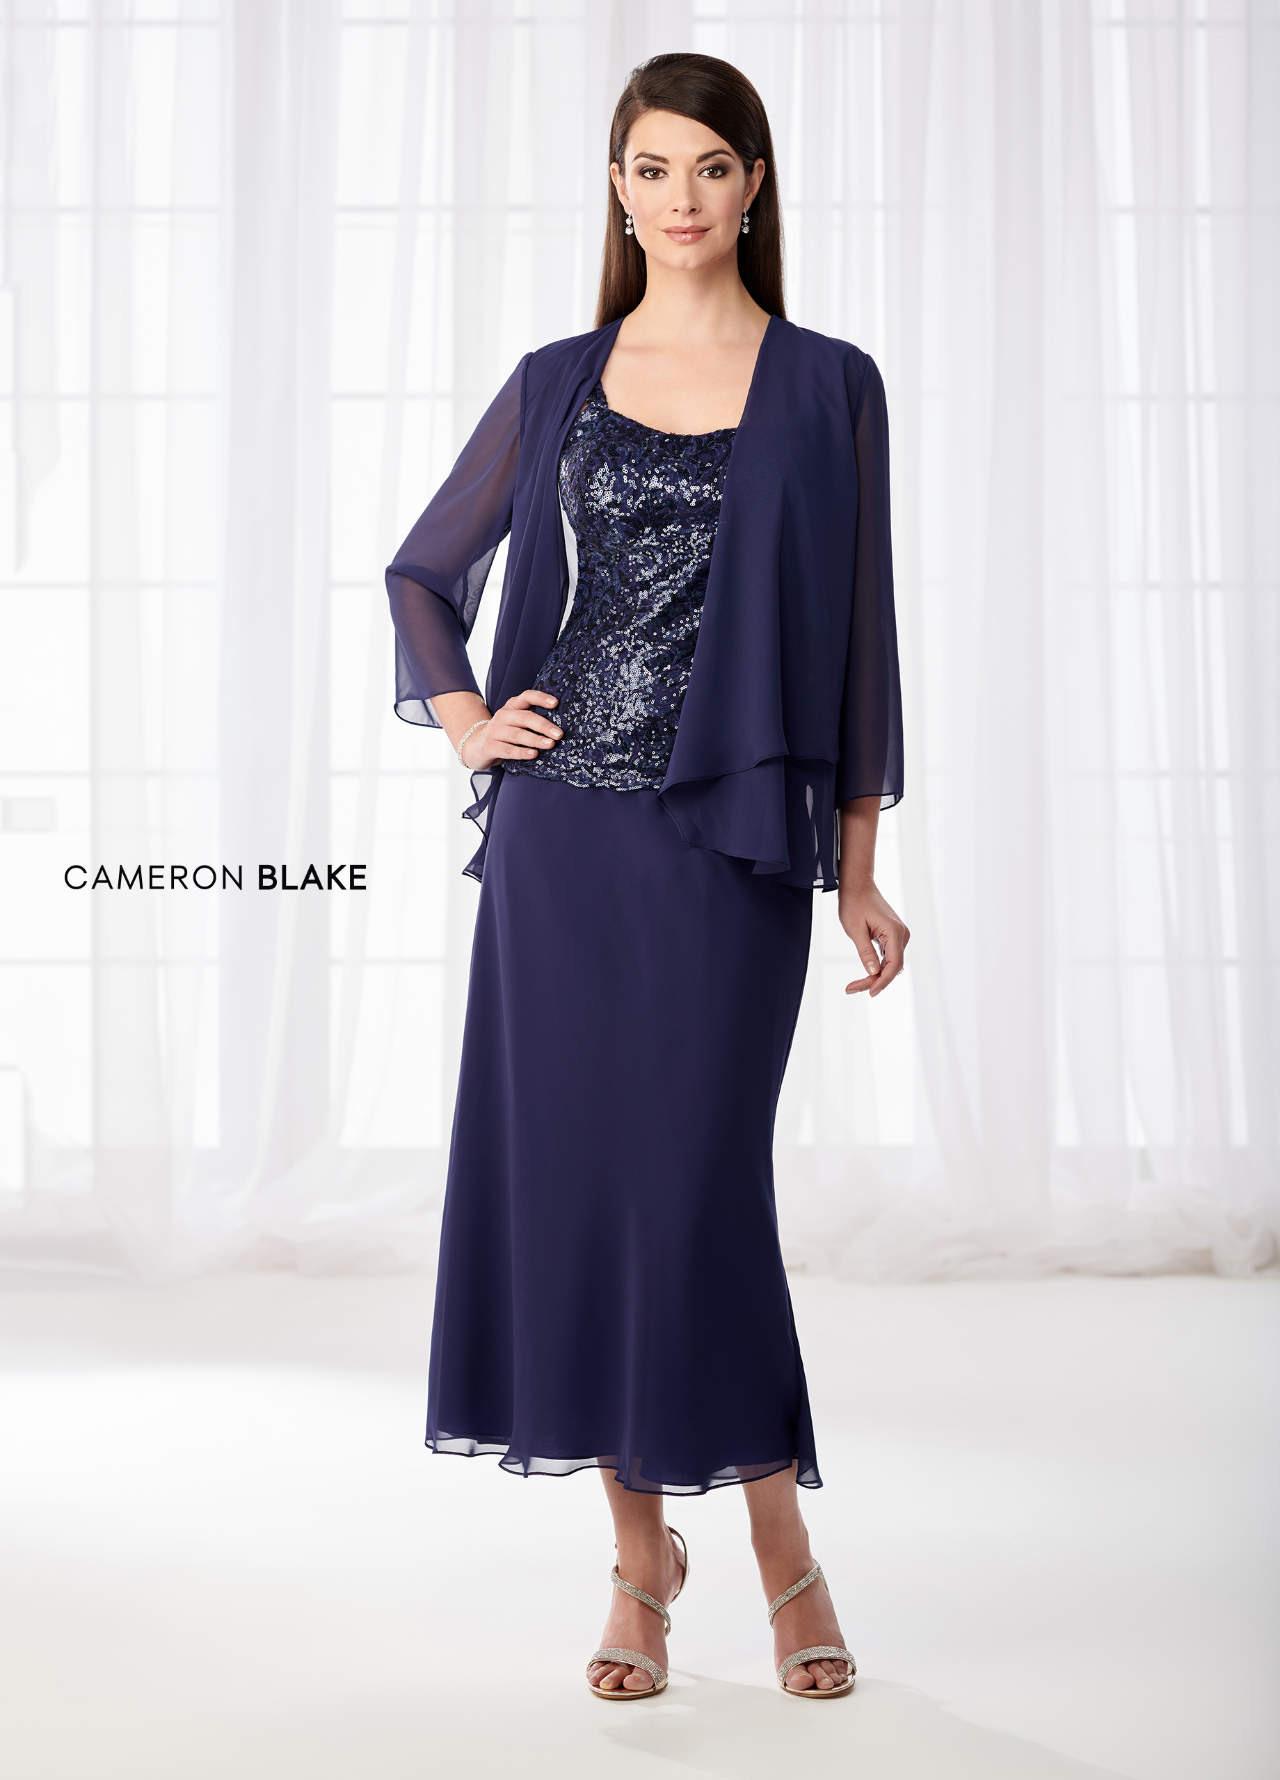 Usa Kleid Mutter Bräutigam 9Efd 9C9 - Abendkleid